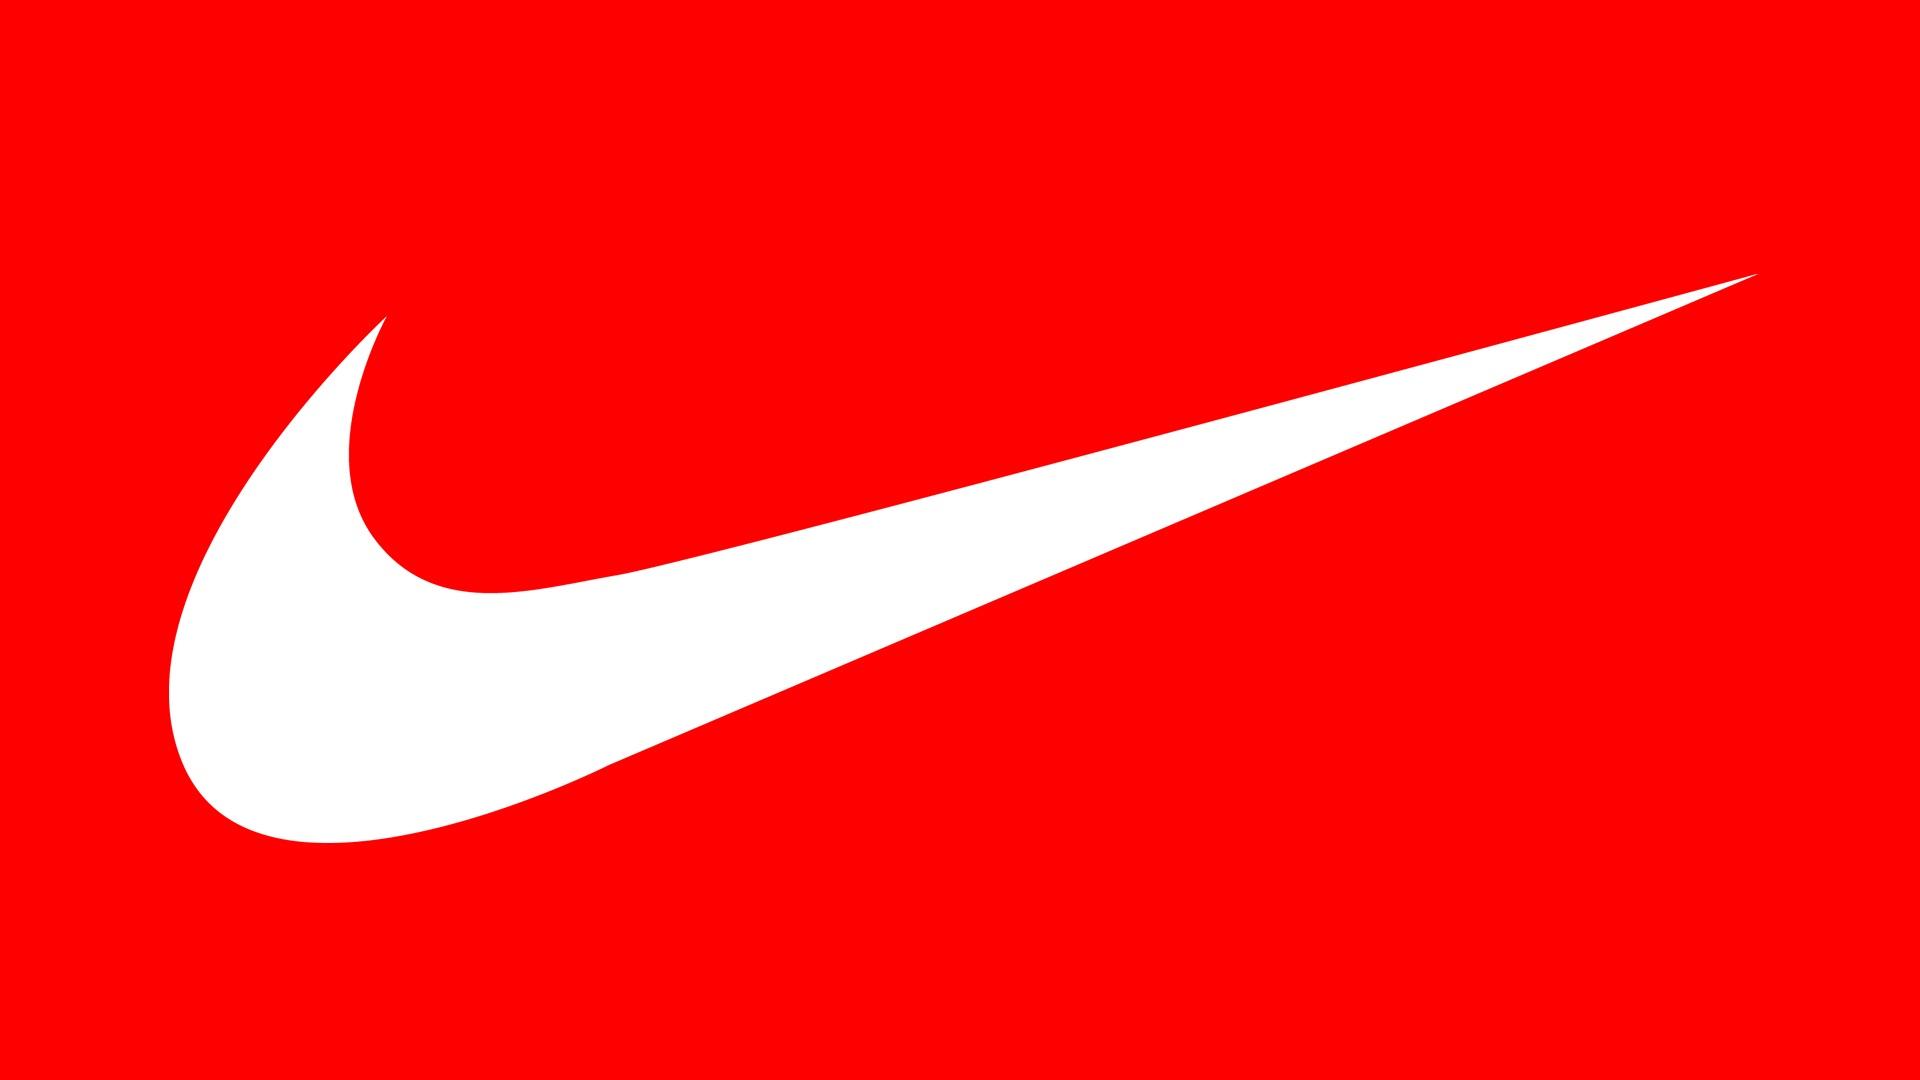 Superar medio litro hacer clic  Free Nike Wallpaper 41384 1920x1080px